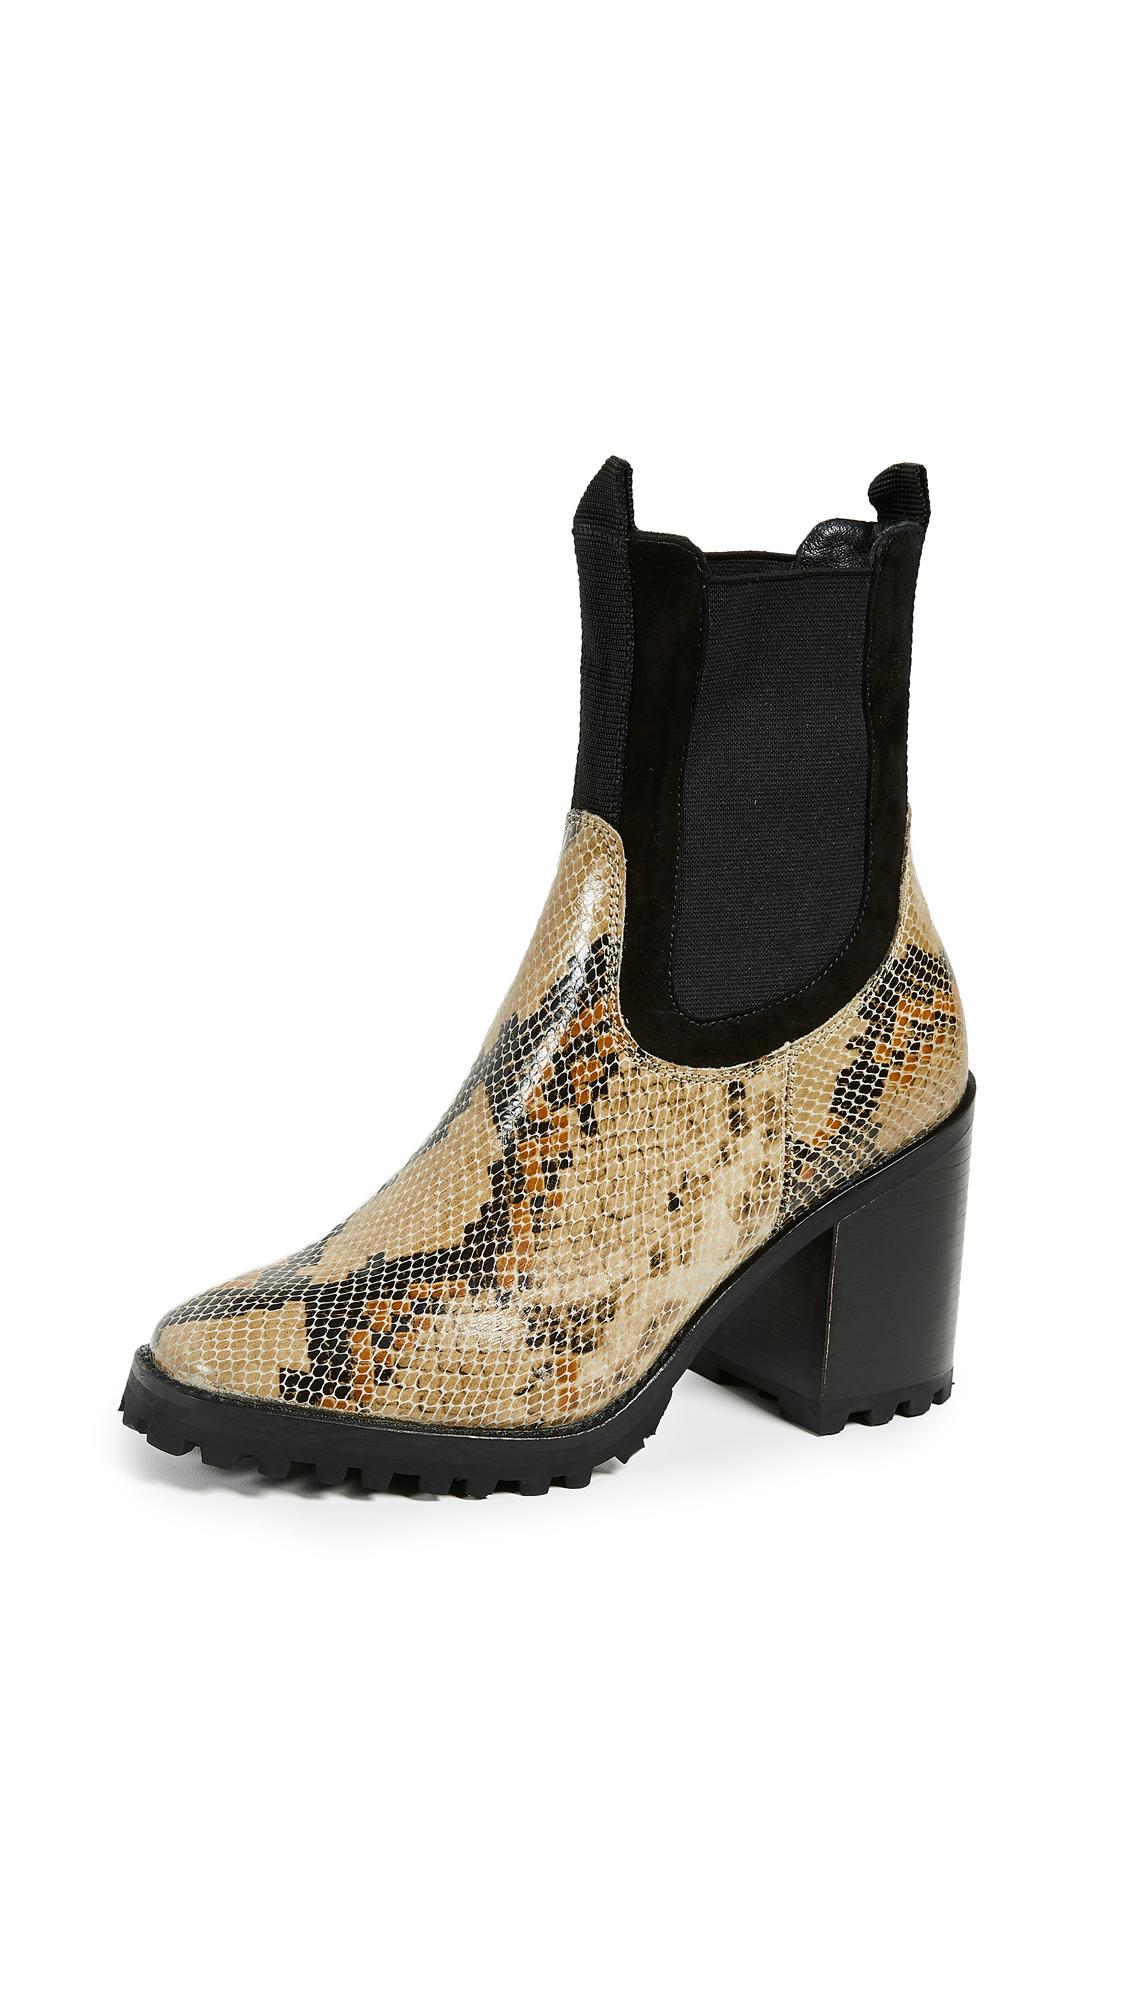 Rachel Comey Stunt Ankle Boots